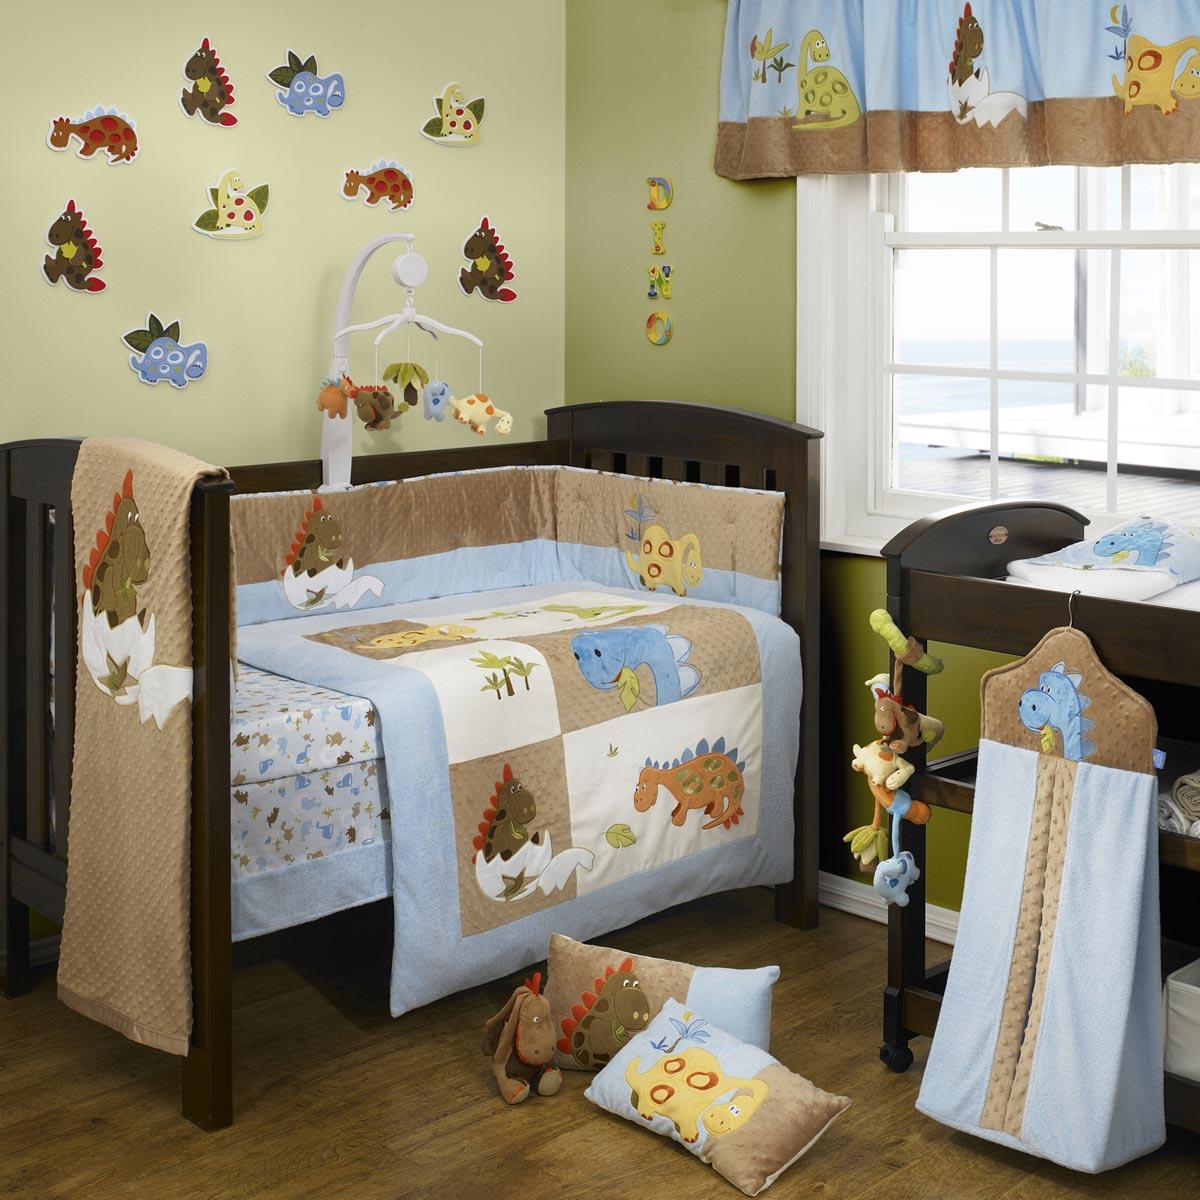 Спальня для мальчика своими руками фото 28